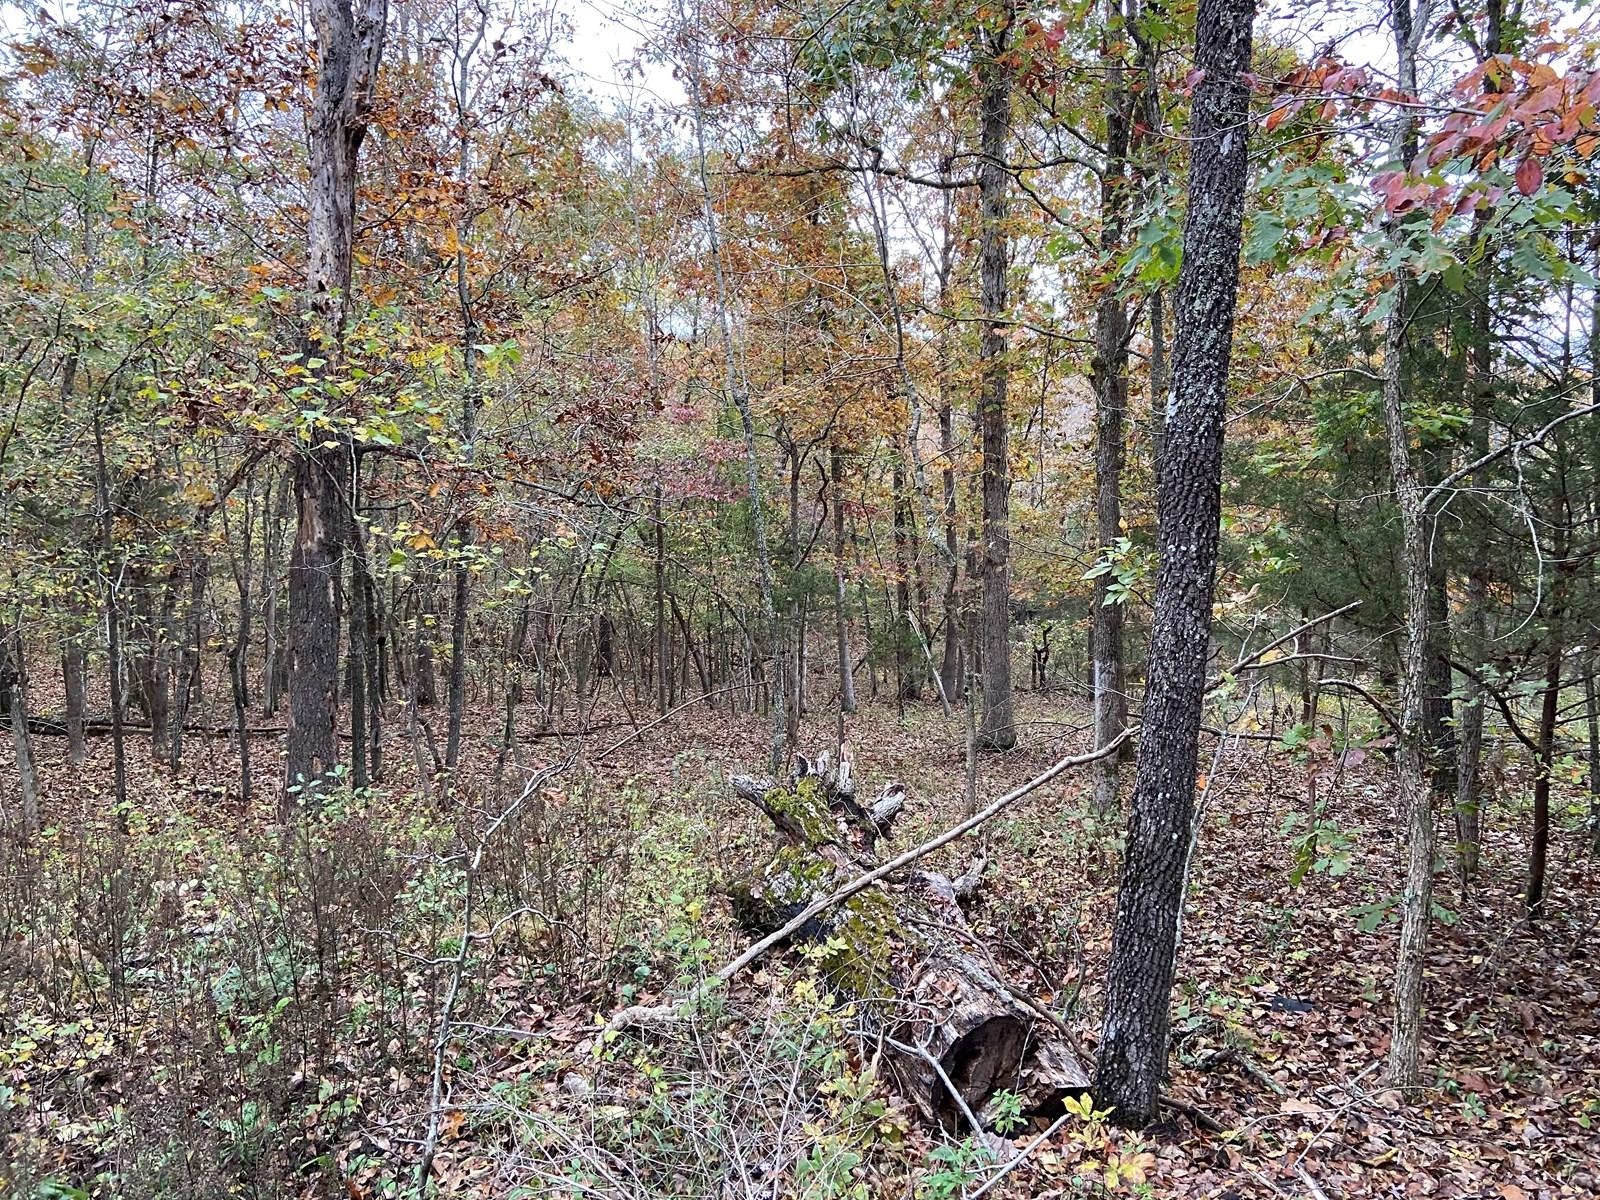 Arkansas Land for sale Hunting land, recreational property